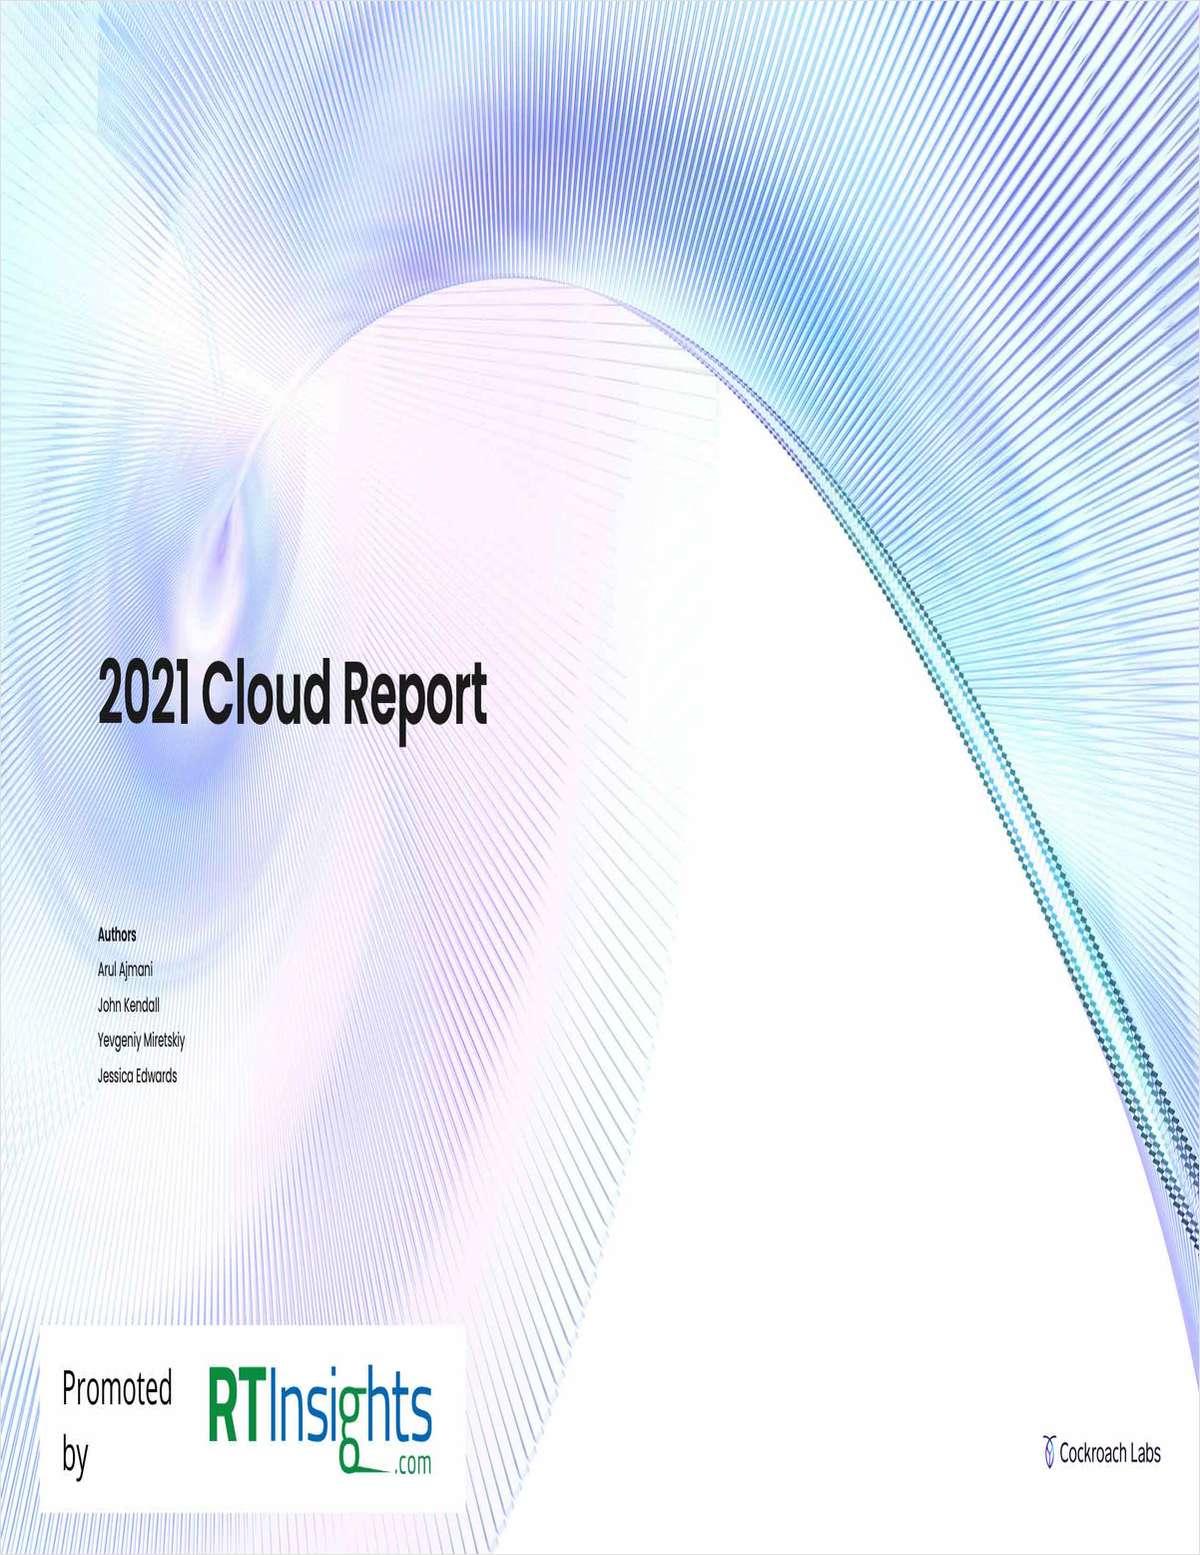 2021 Cloud Report